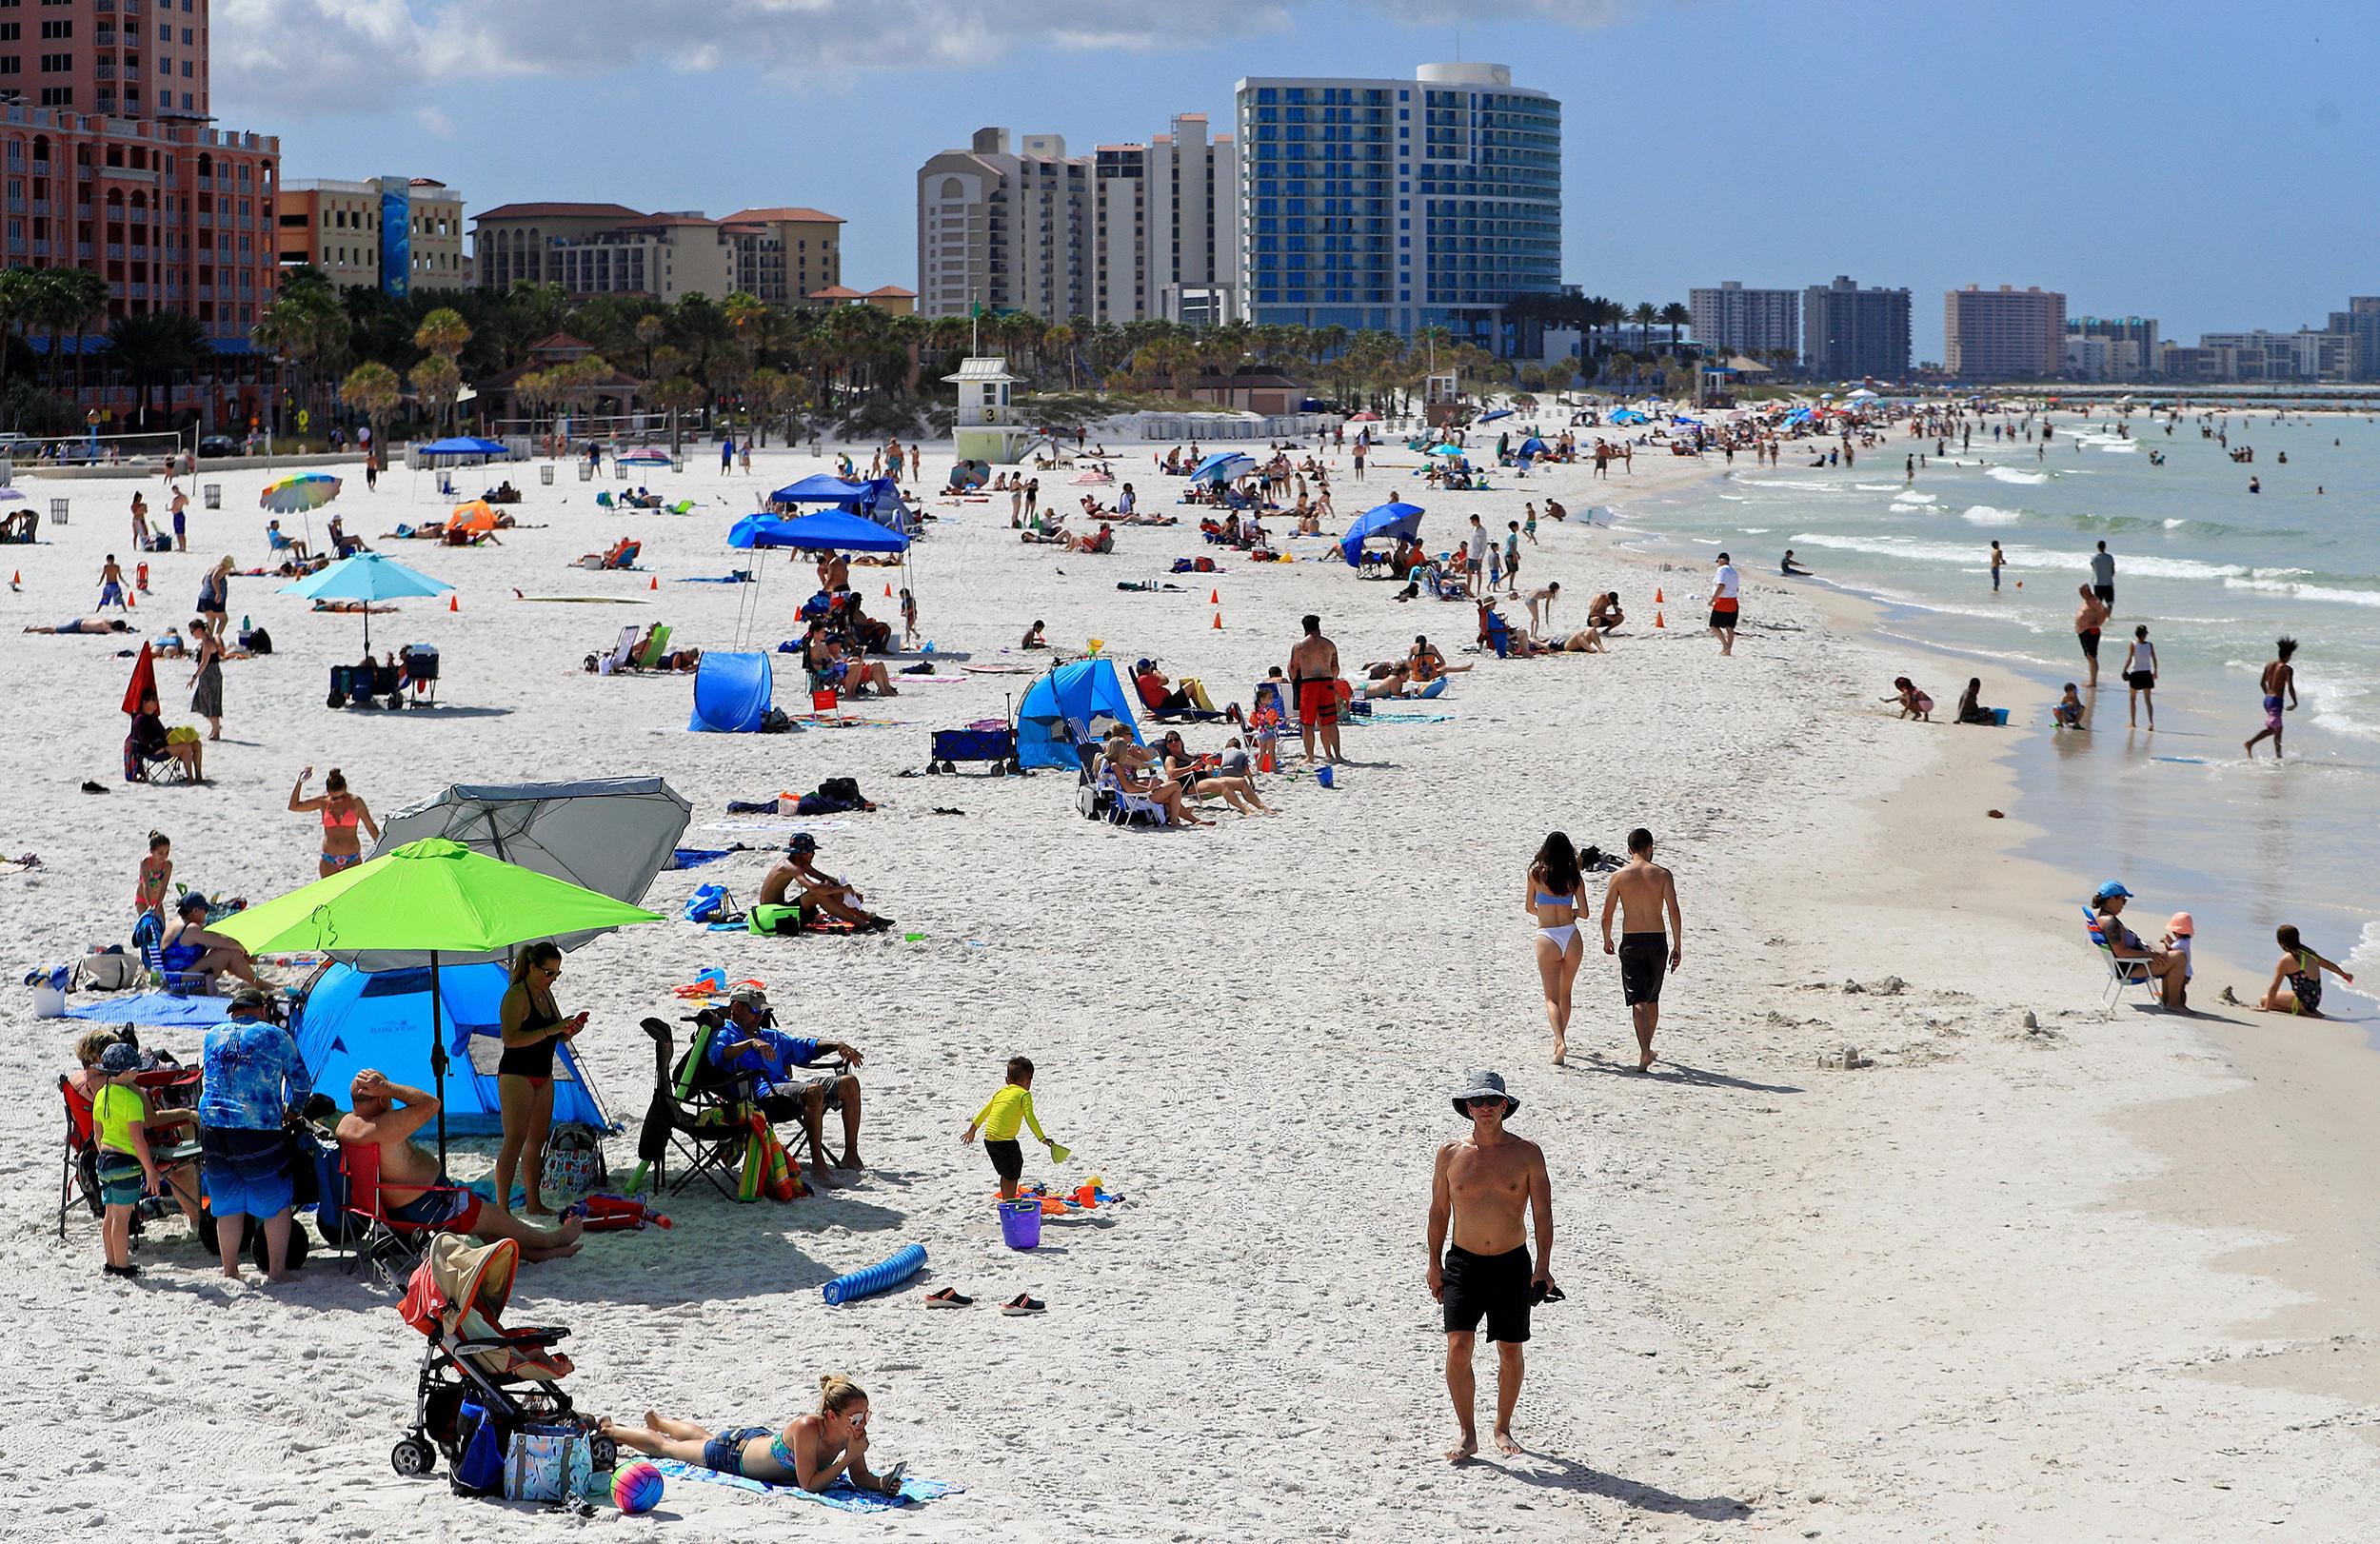 Florida Governor Takes Heat For State S Slow Response To Coronavirus Crisis